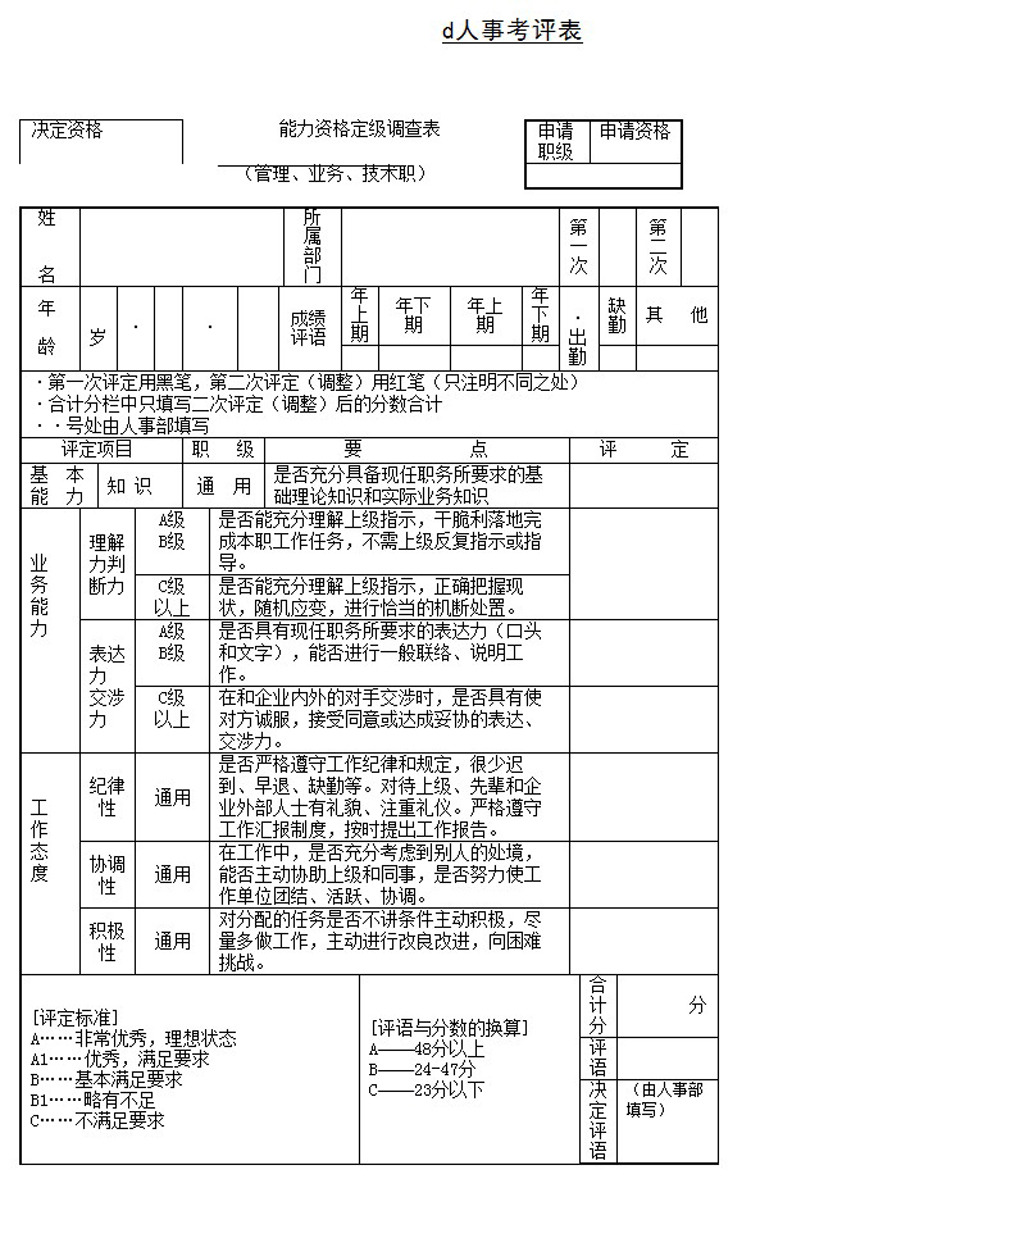 人事考评表word模板下载图片下载 人事考评表word模板下载 word表格